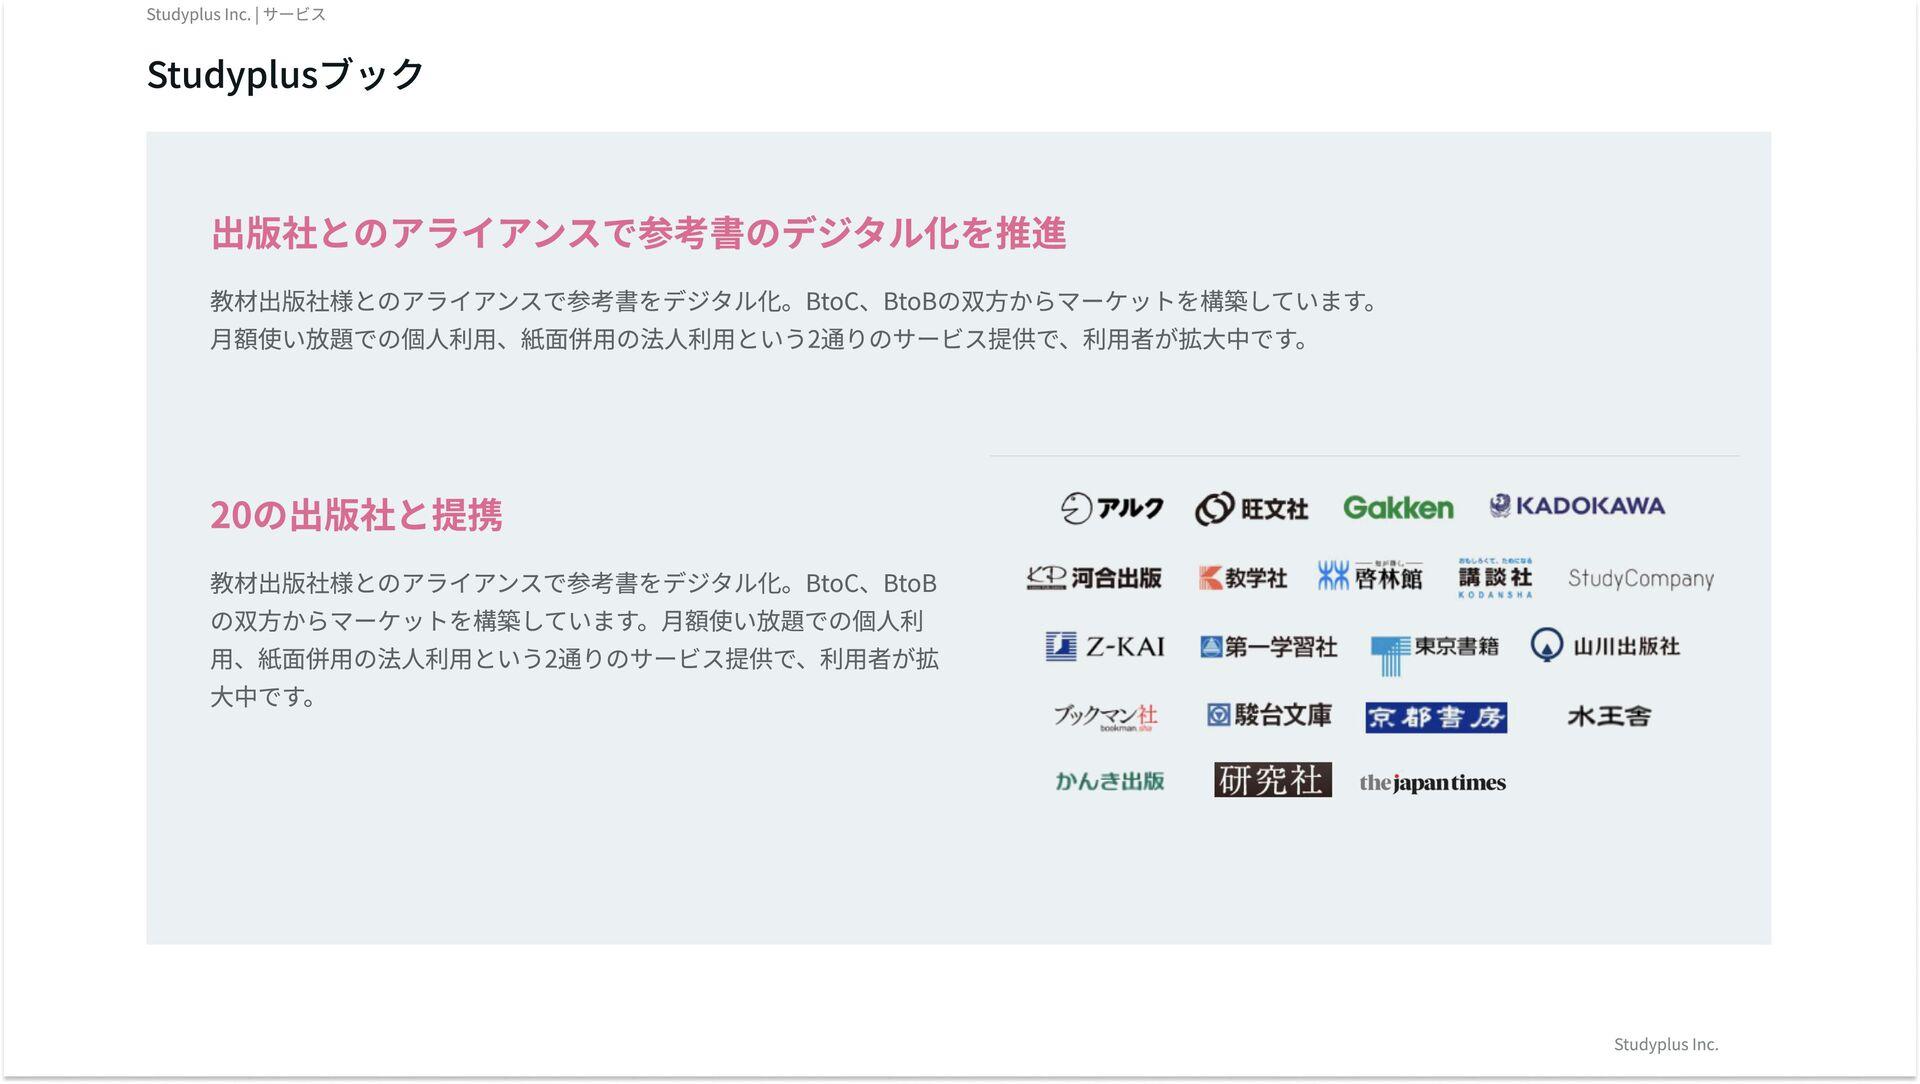 Studyplus for School サービス全体像 01 #Plan 学習計画機能 カレ...